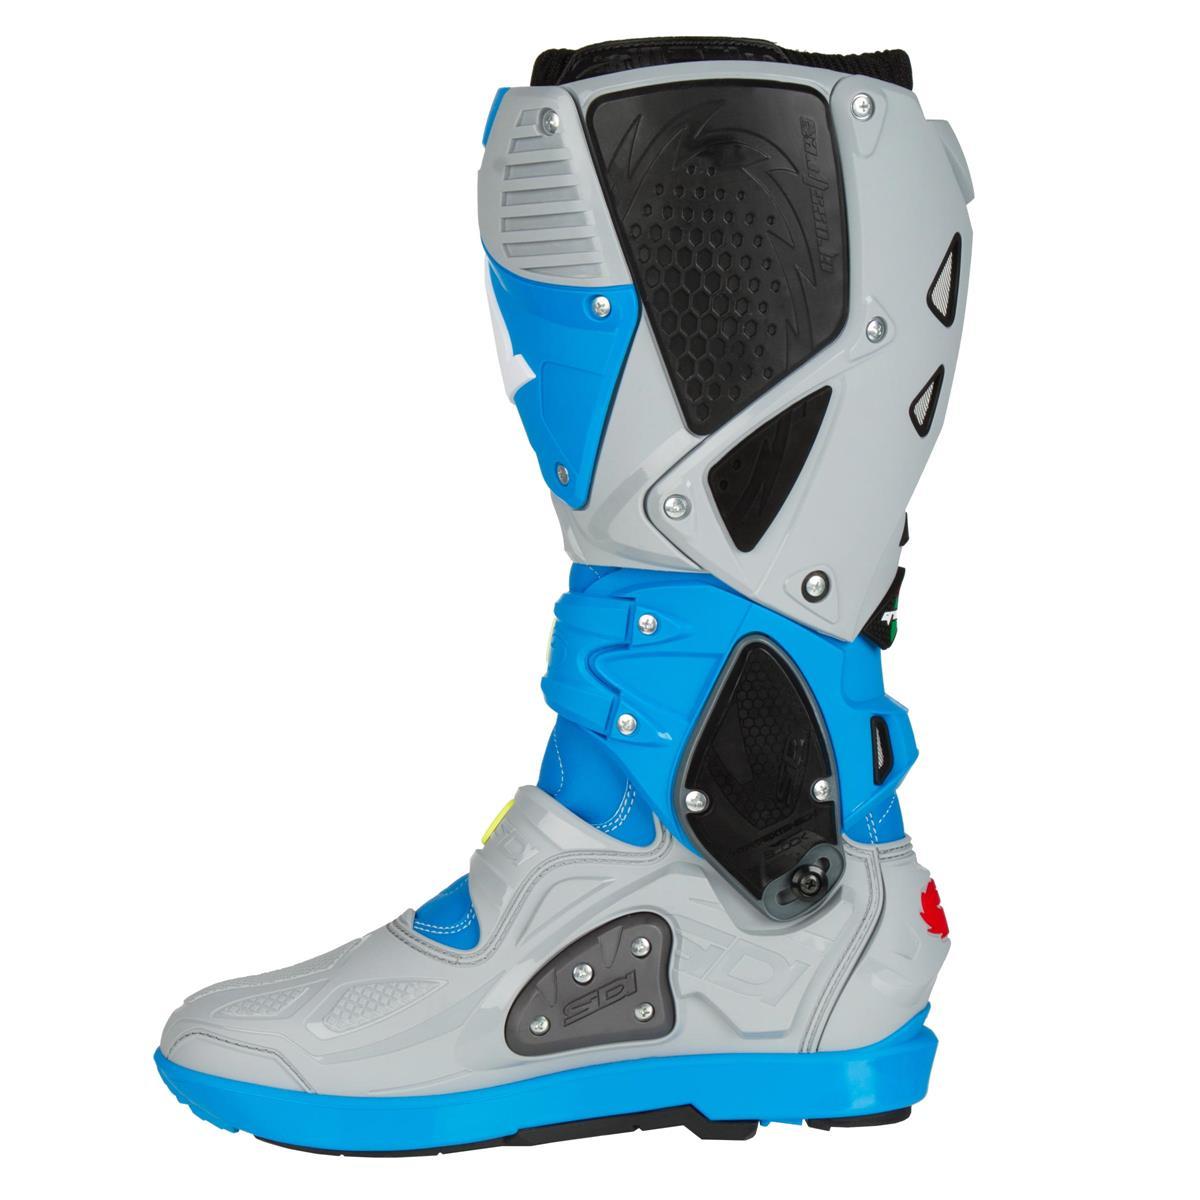 sidi-motocross-stiefel-mx-boots-crossfire-3-srs-3 (1)